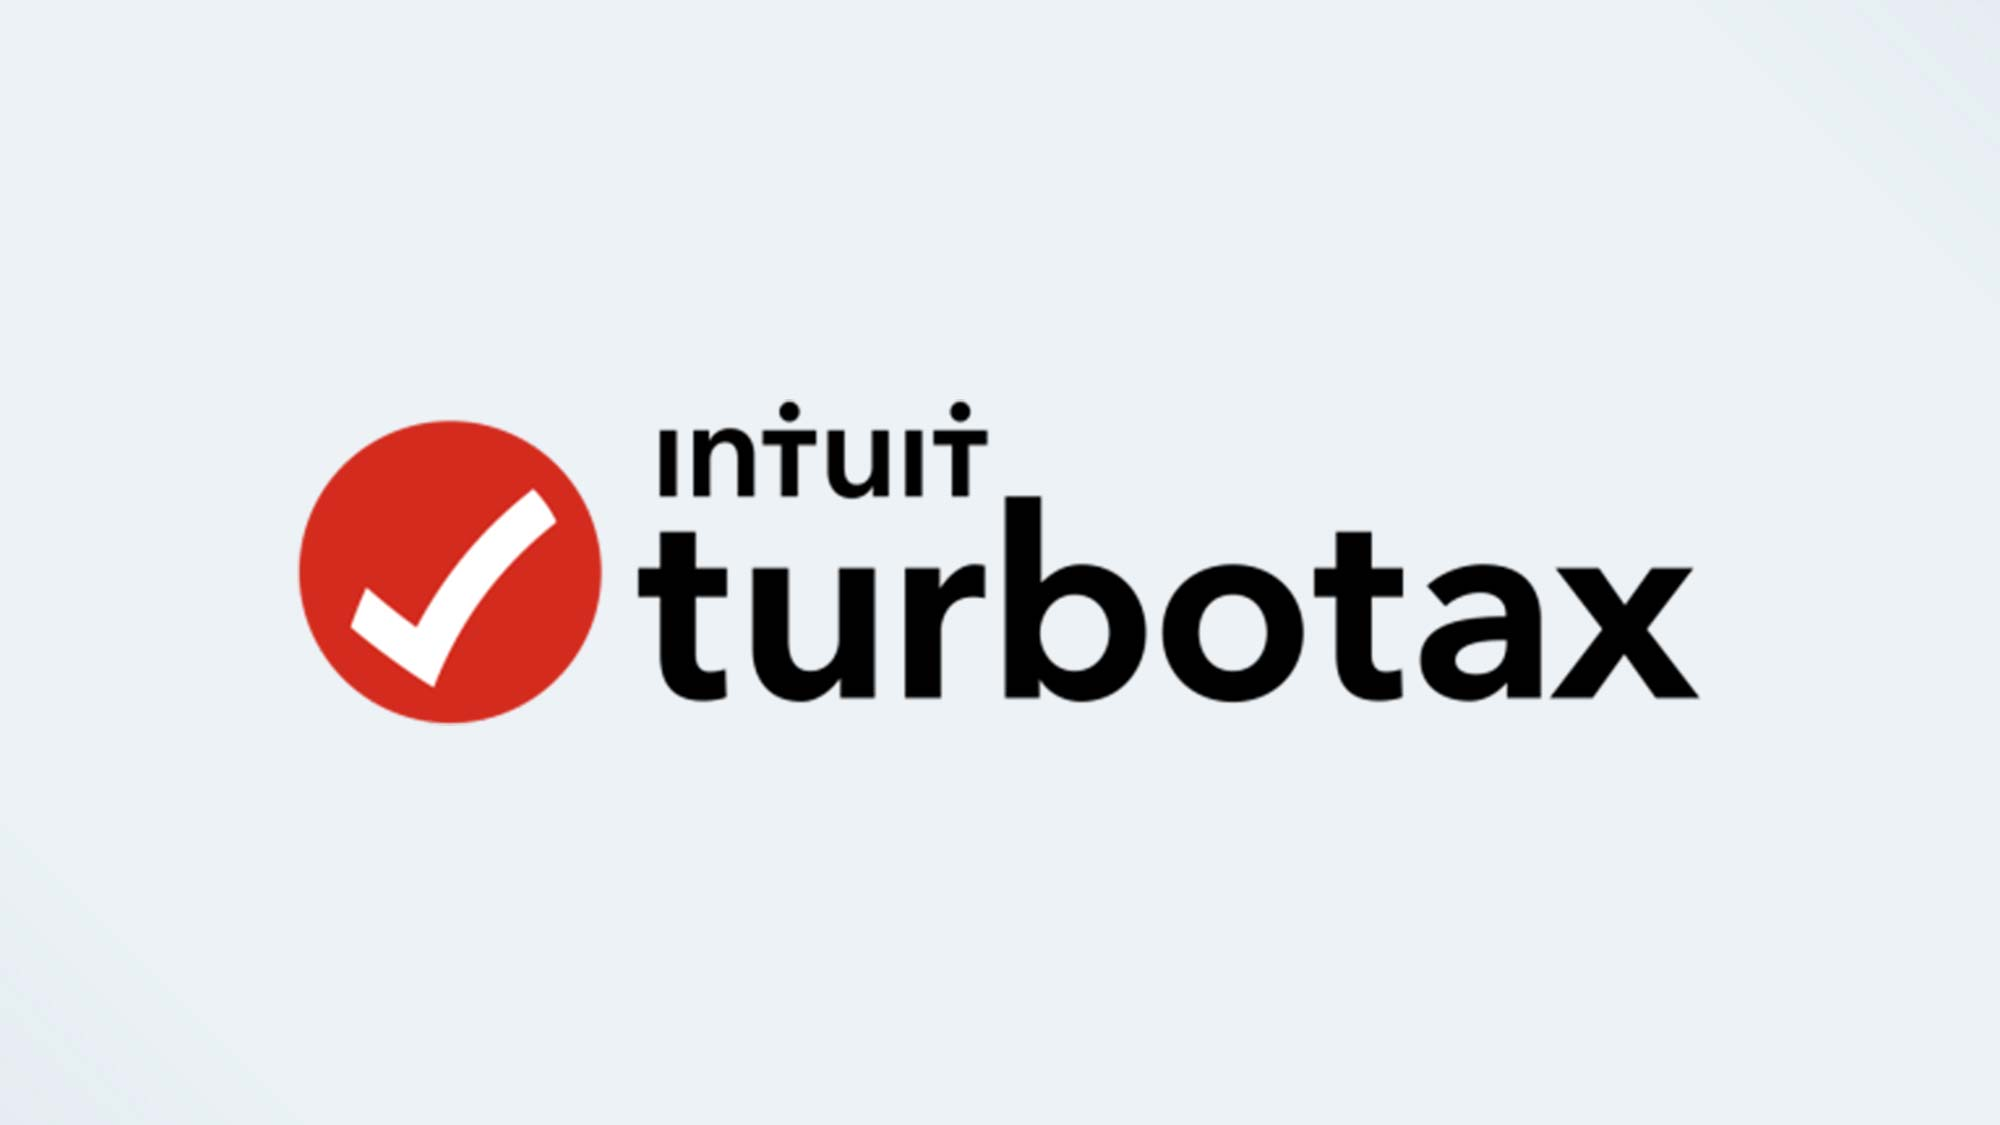 Best tax software: Intuit Turbotax